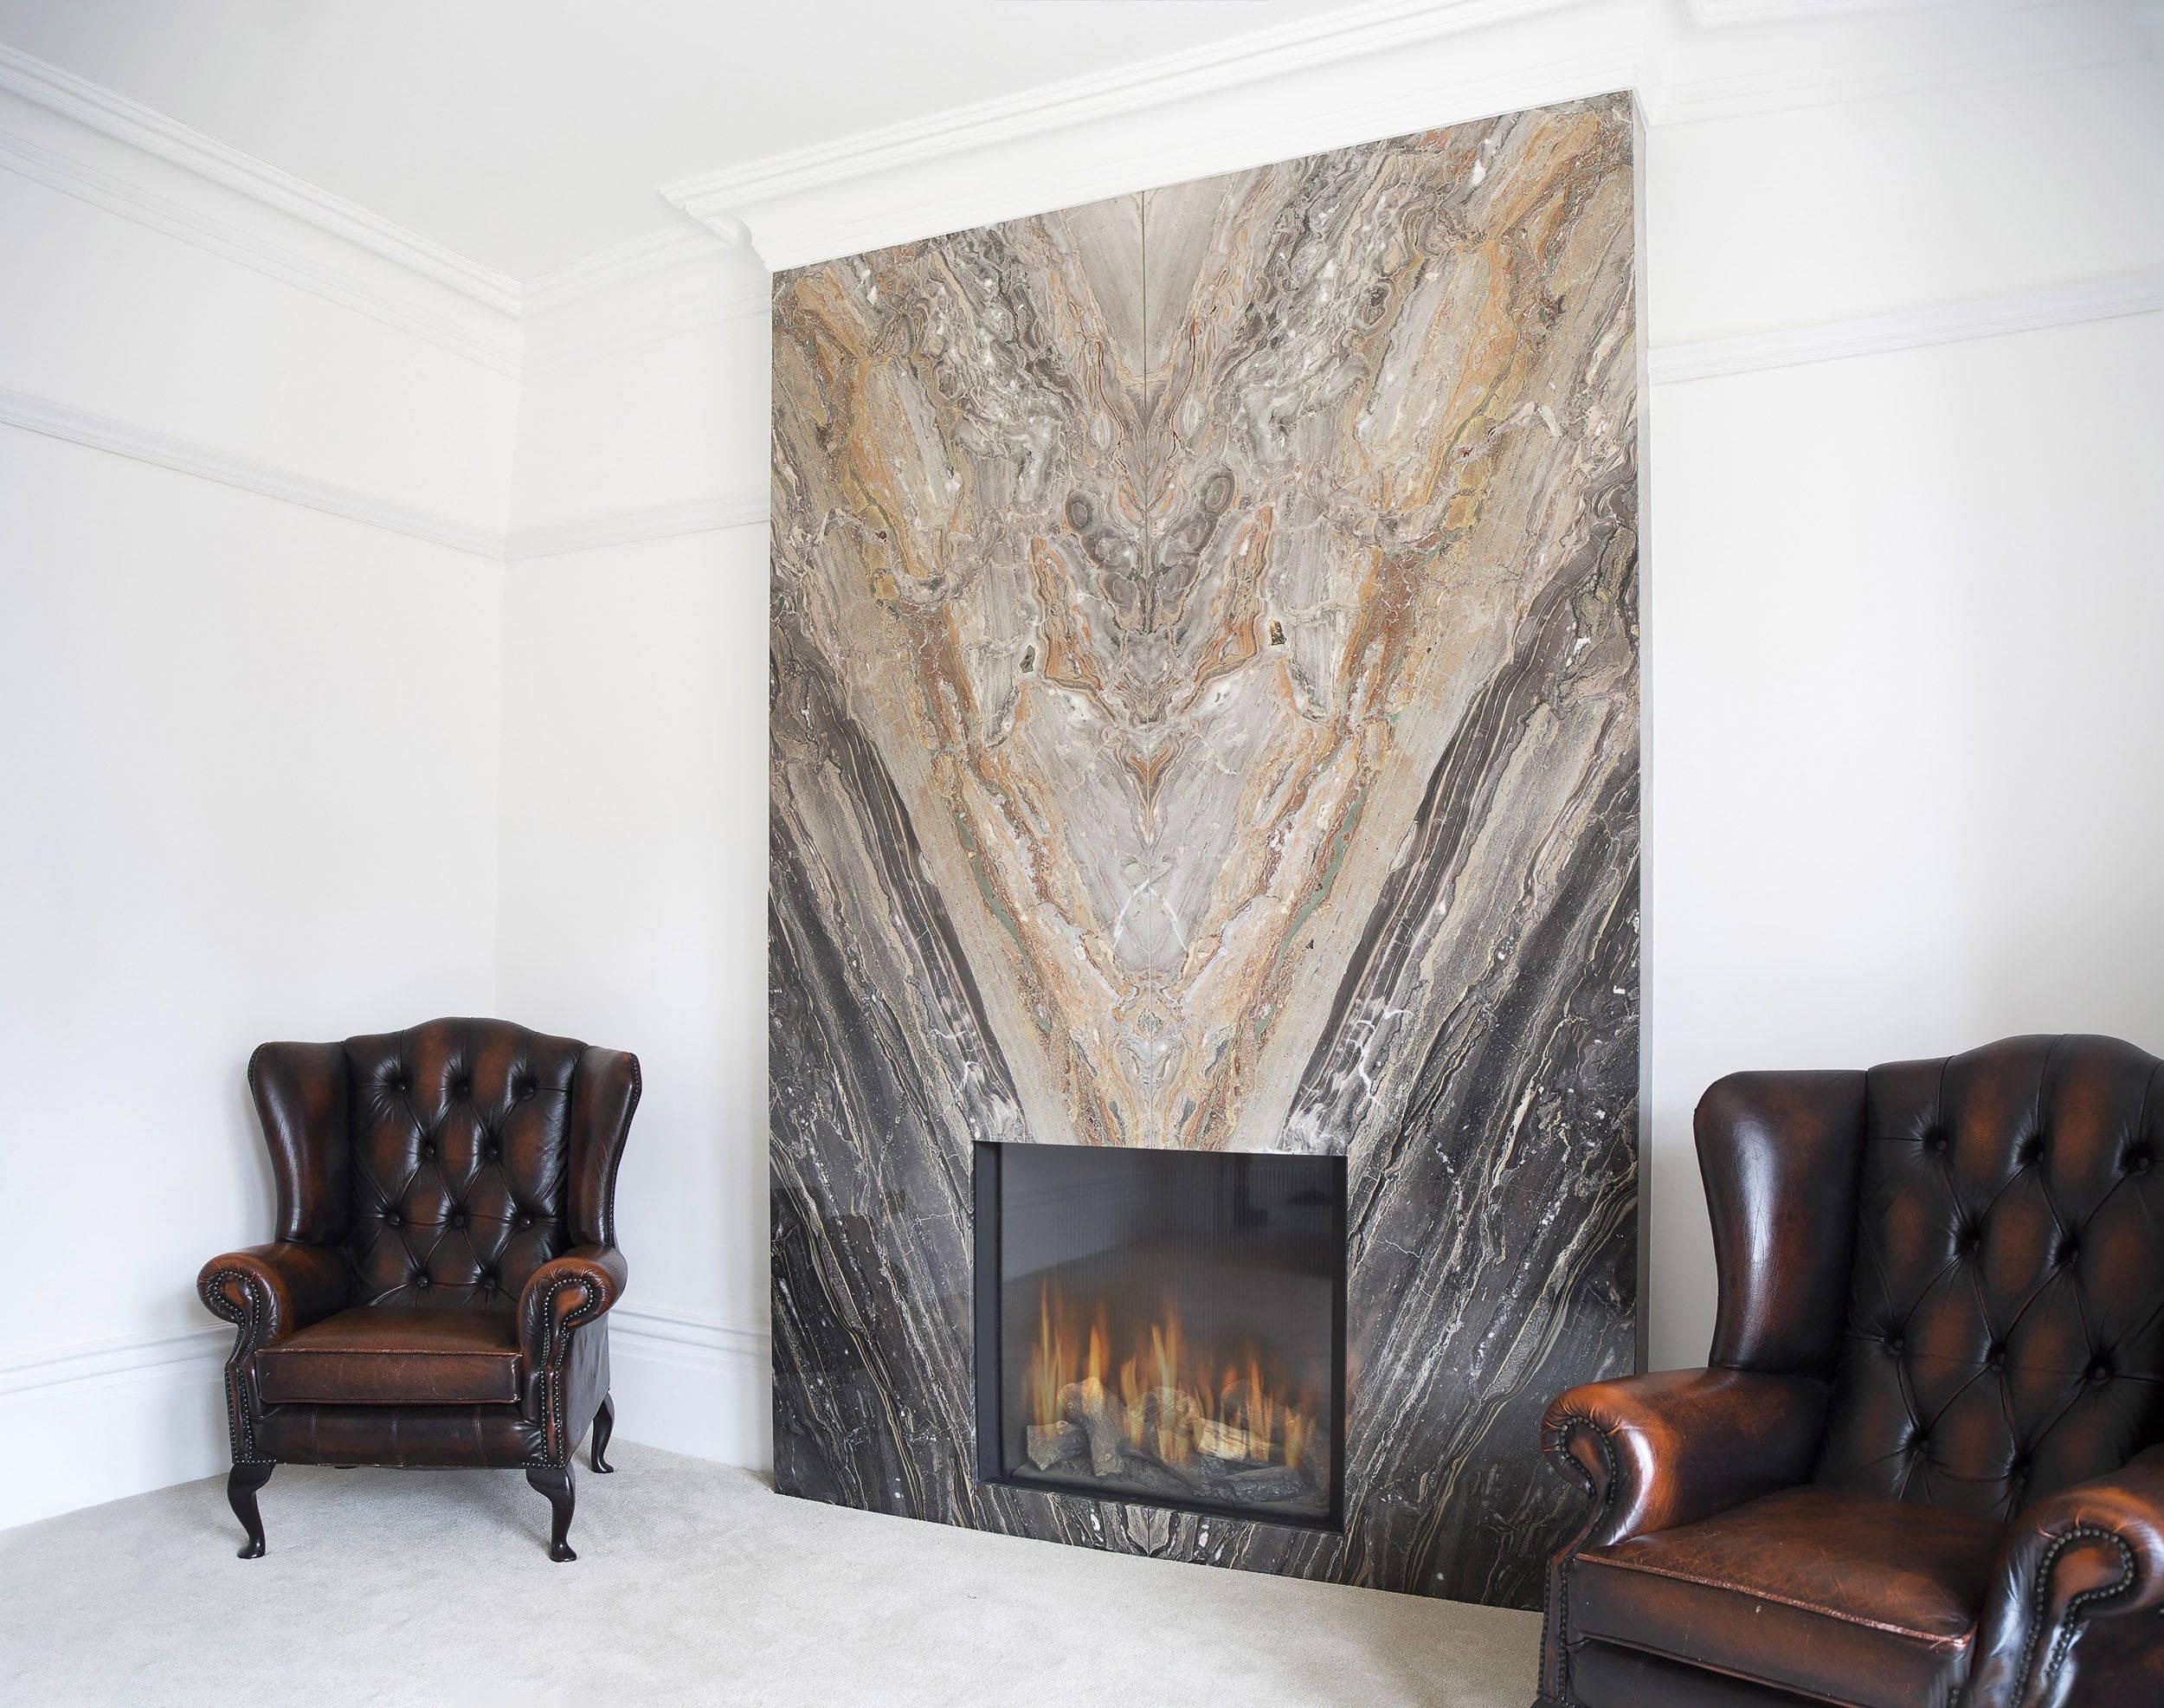 Oribico Fireplace